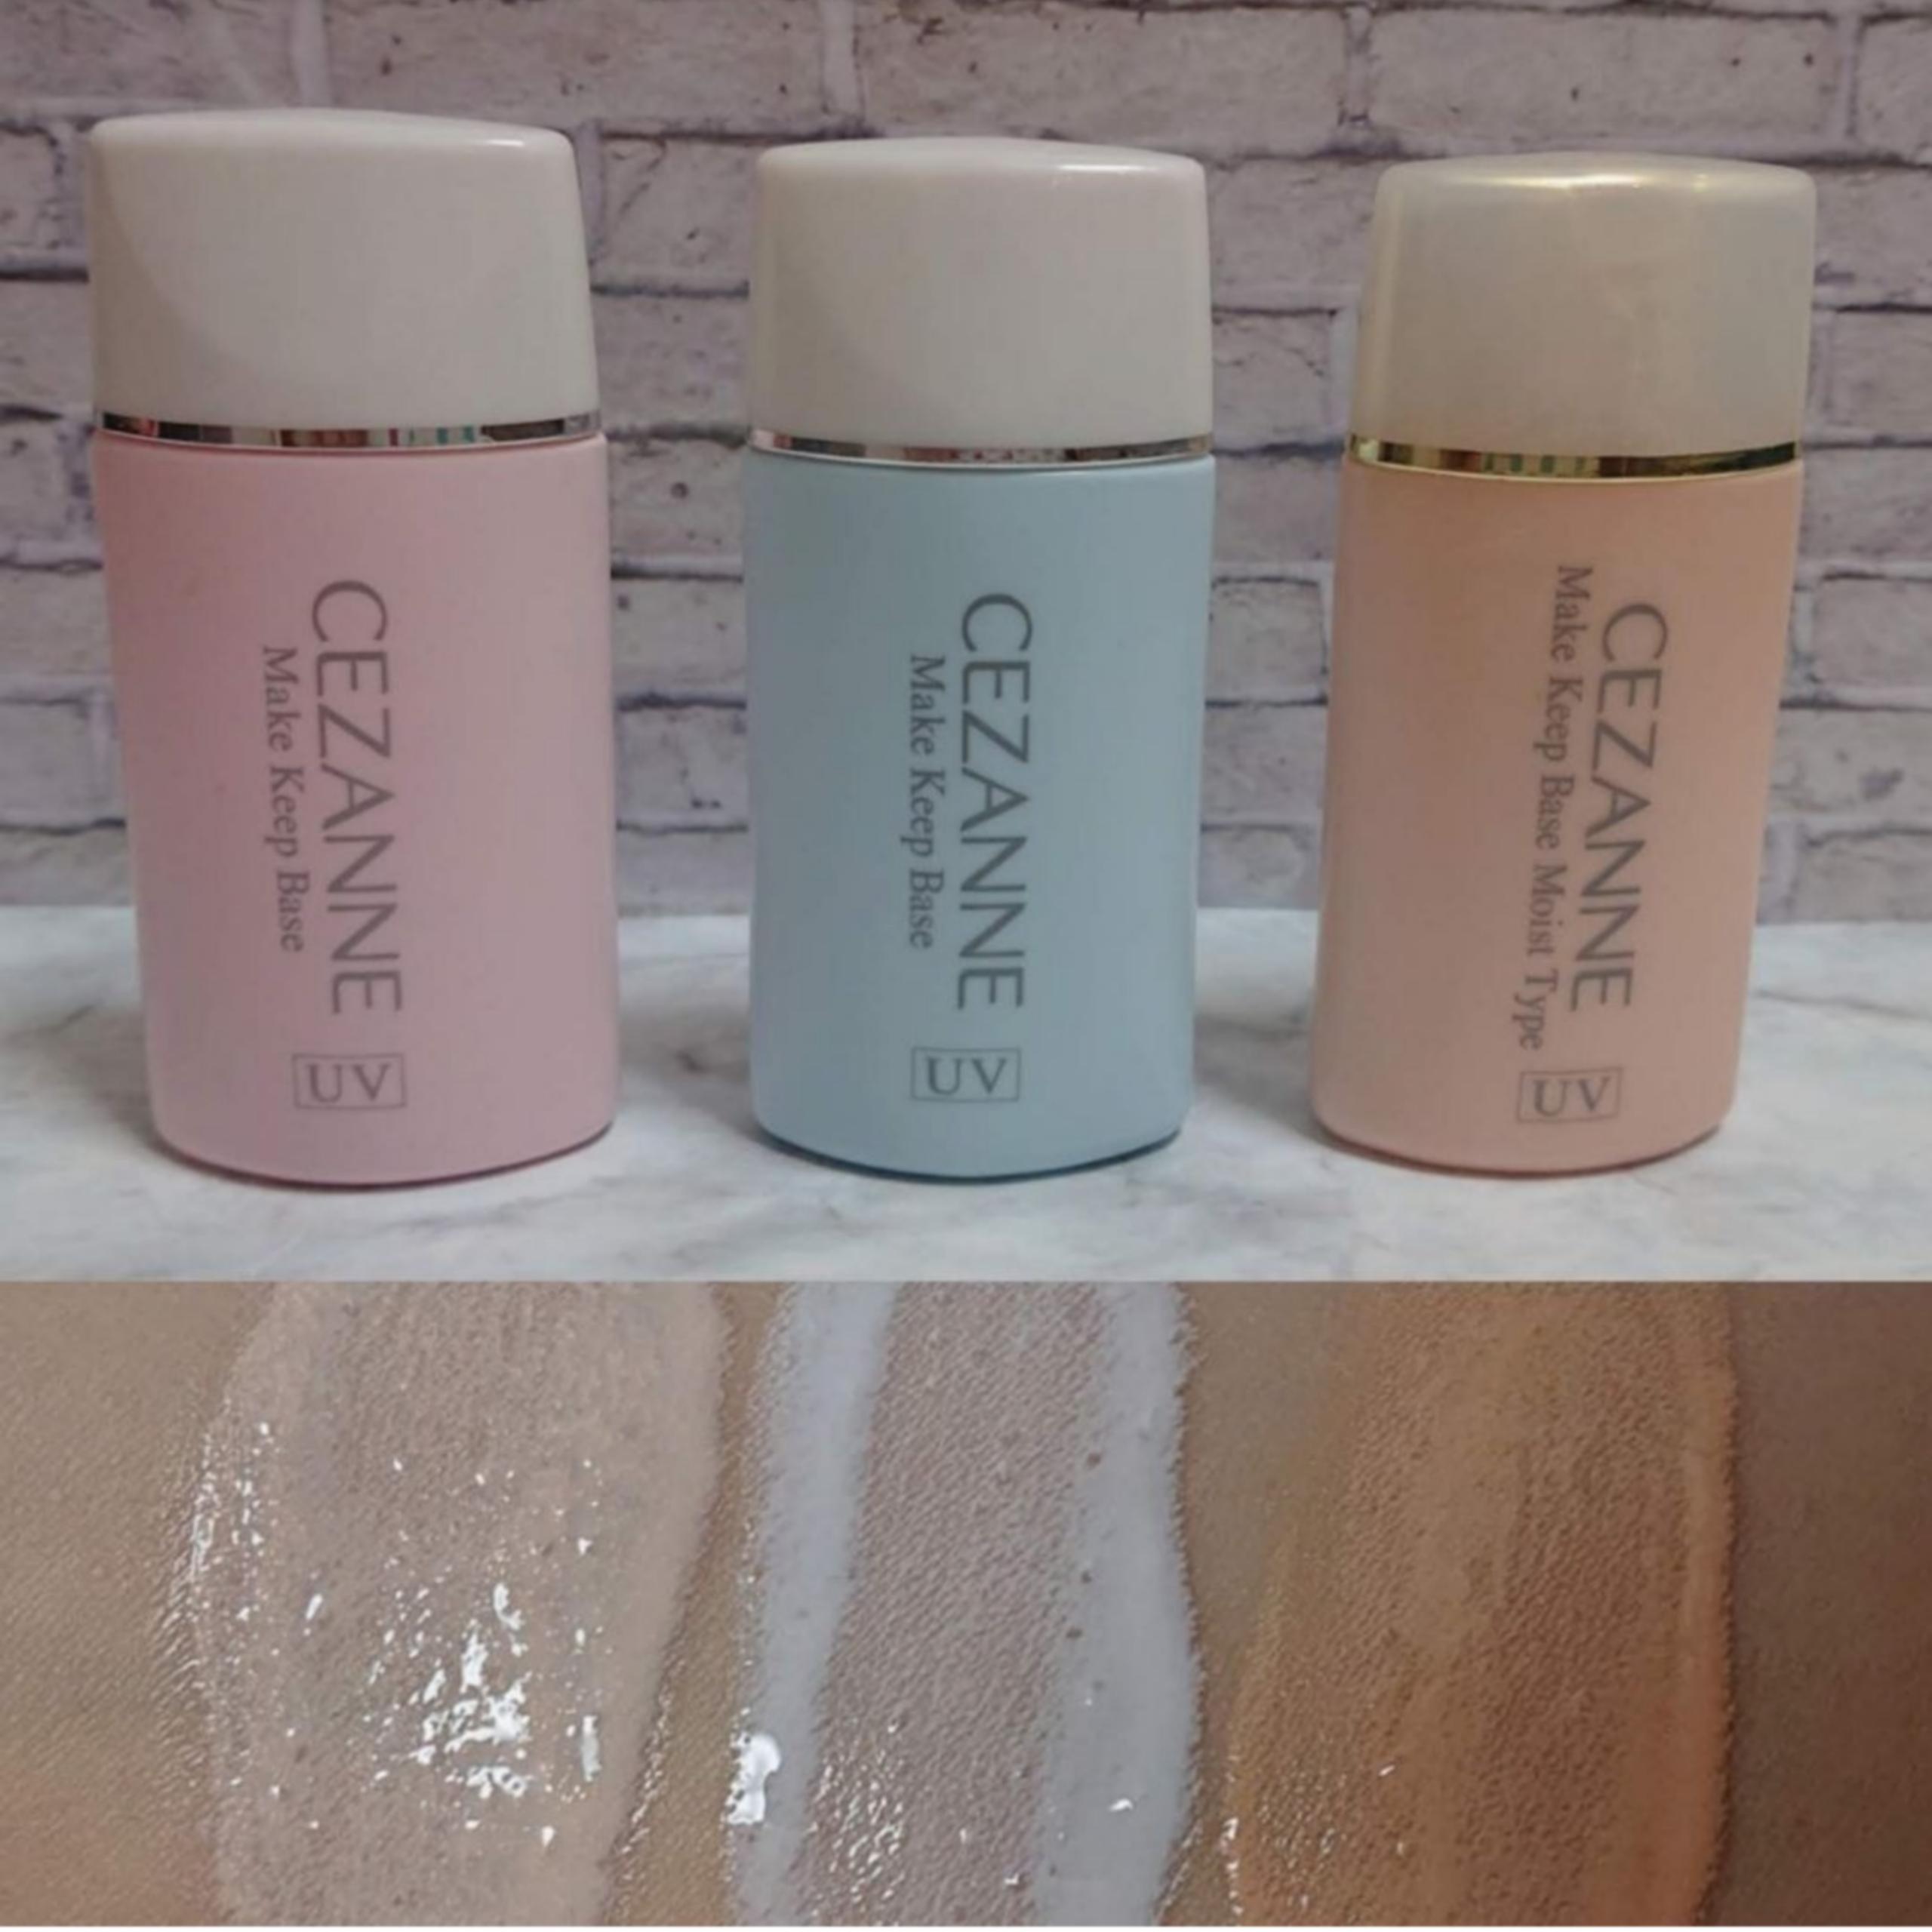 CEZANNE(セザンヌ) 皮脂テカリ防止下地 保湿タイプの良い点・メリットに関するchan_ayaさんの口コミ画像3